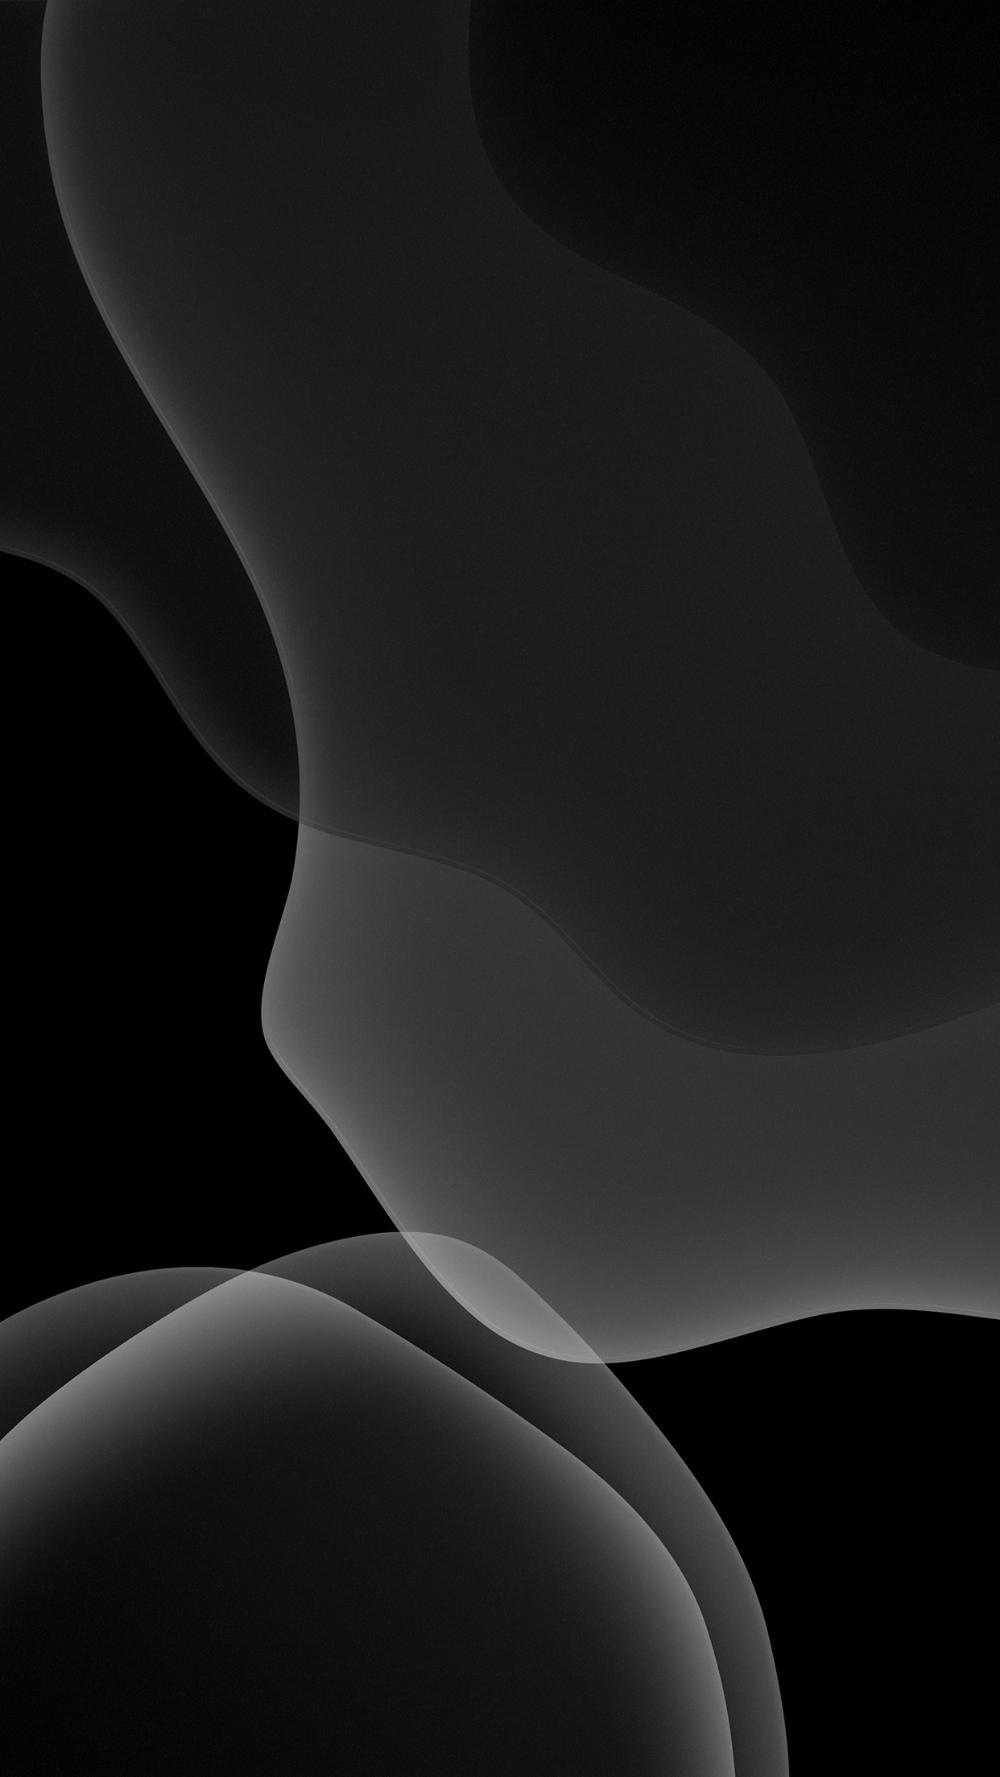 iOS 13 Dark Mode Wallpaper iPhone XR, iPhone XS, iPhone XS Max, iPhone X #ios13wallpaper